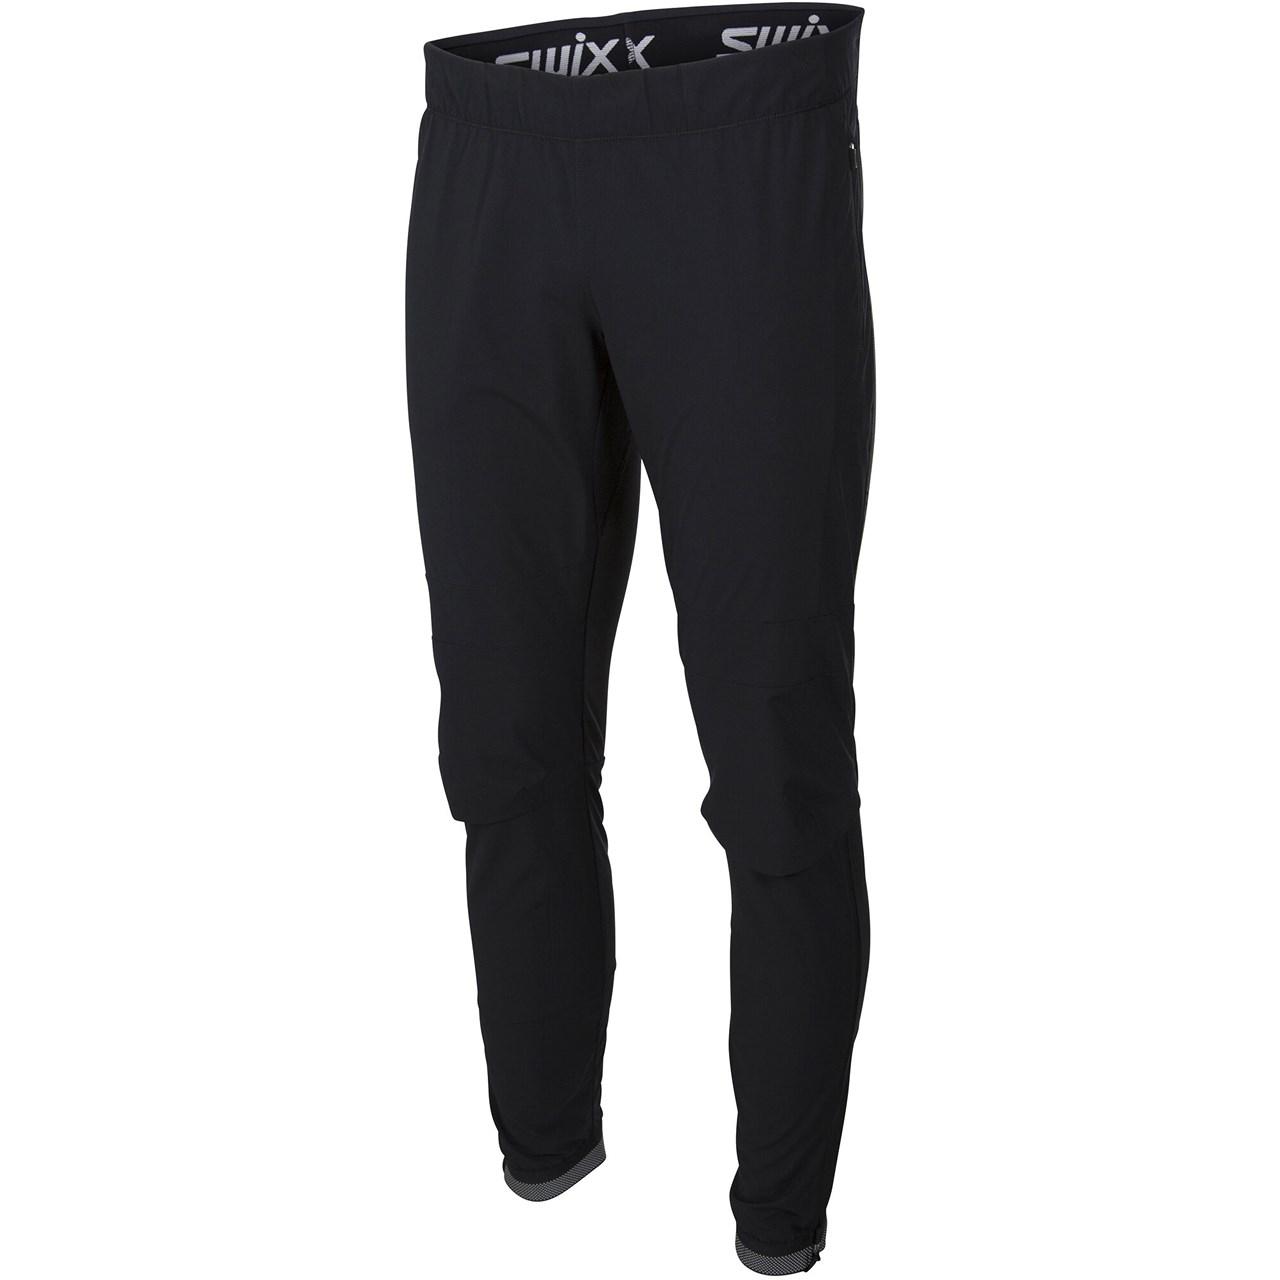 Infinity pants M